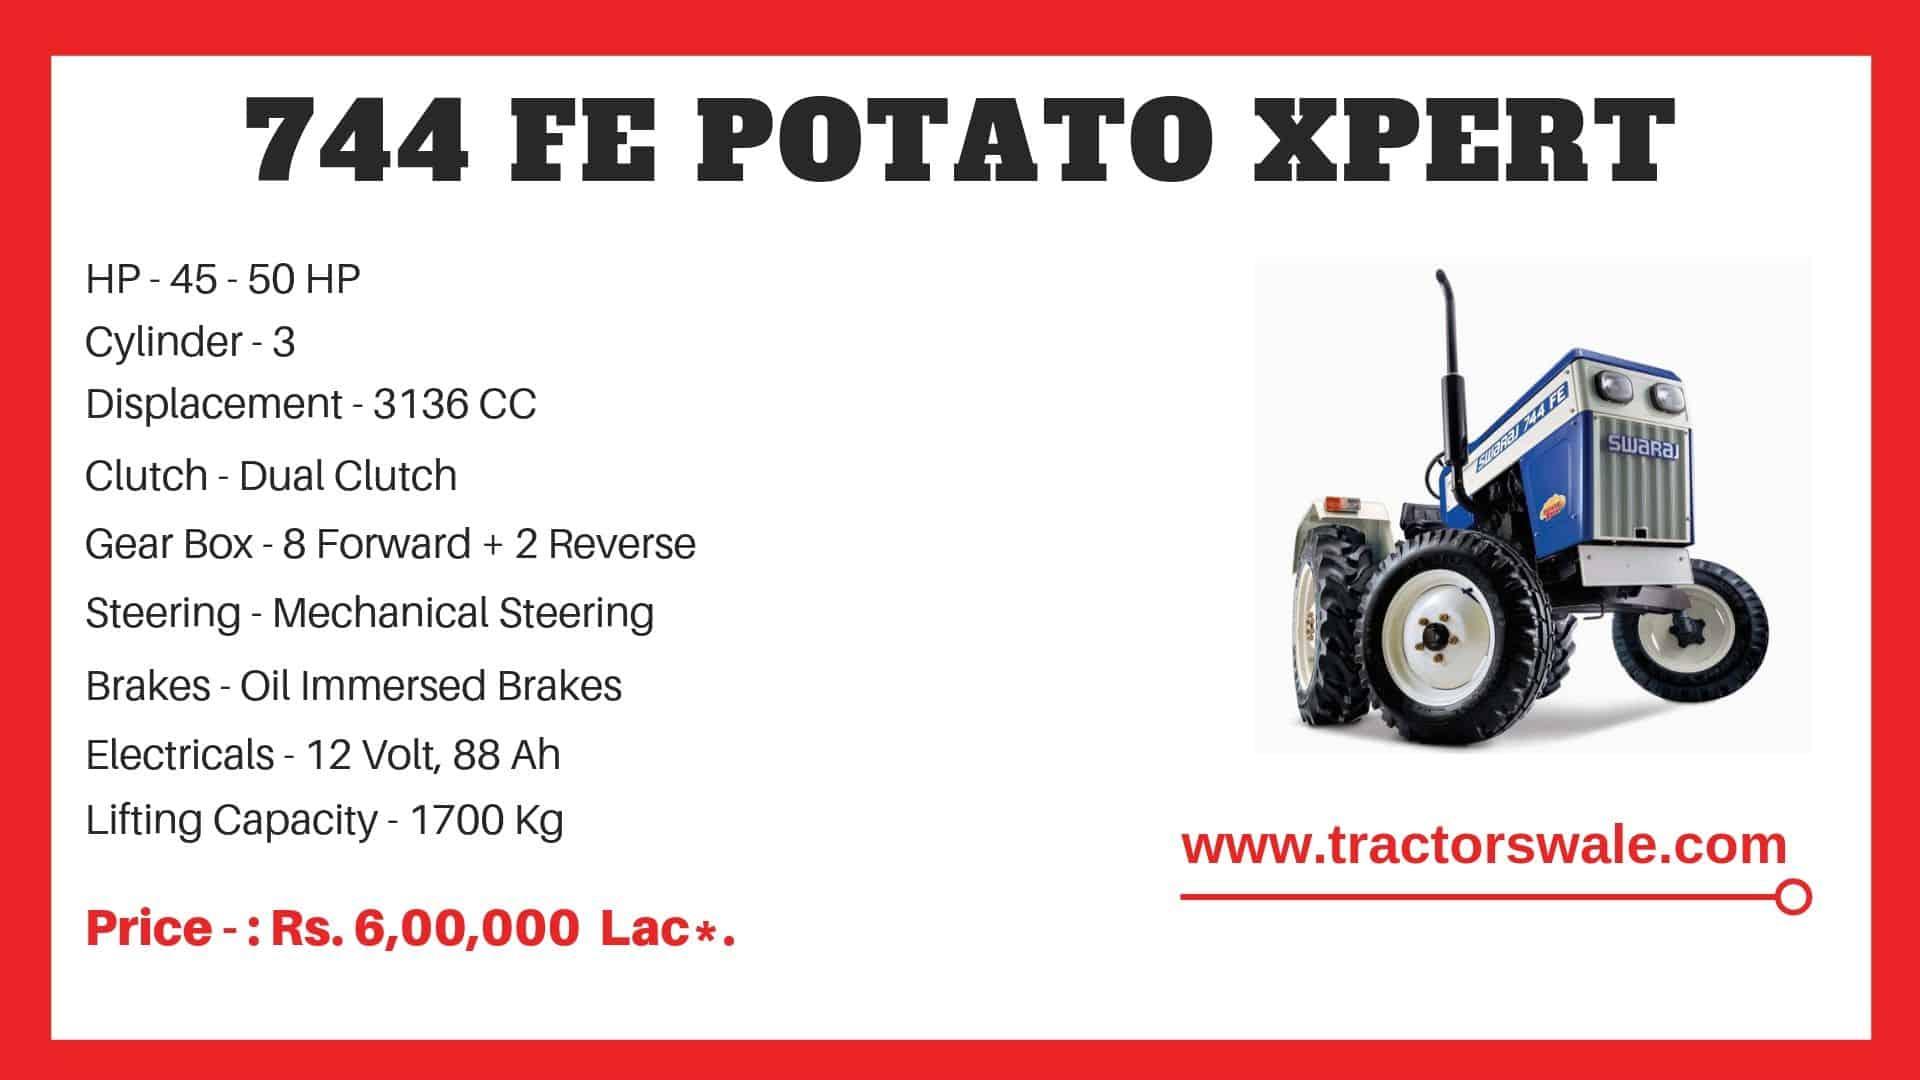 Specification of Swaraj 744 FE Potato Xpert Tractor